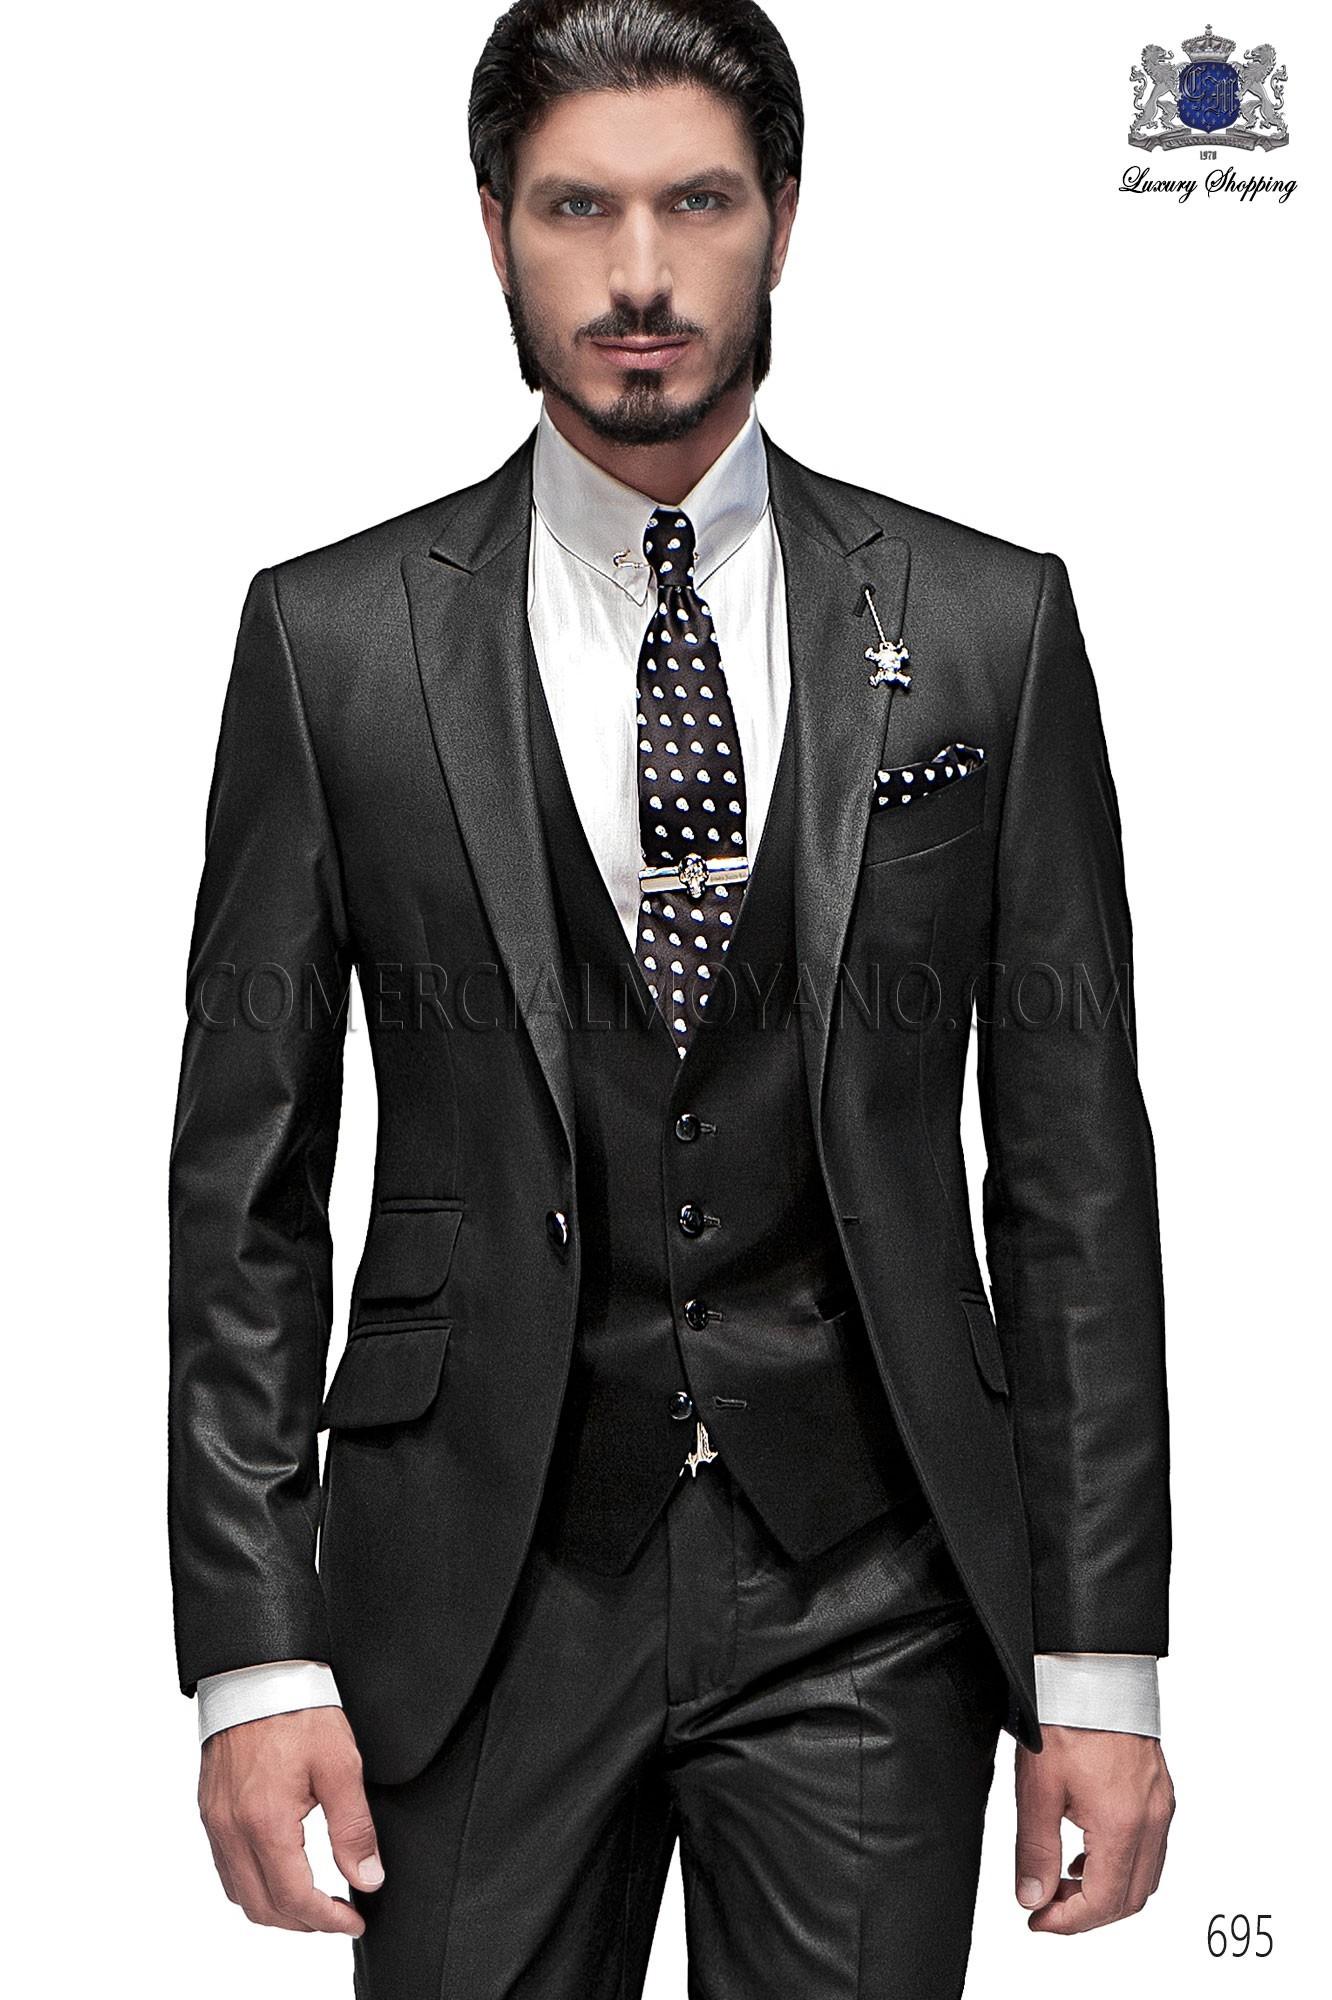 italienische schwarze m nner mode anzug ongala. Black Bedroom Furniture Sets. Home Design Ideas